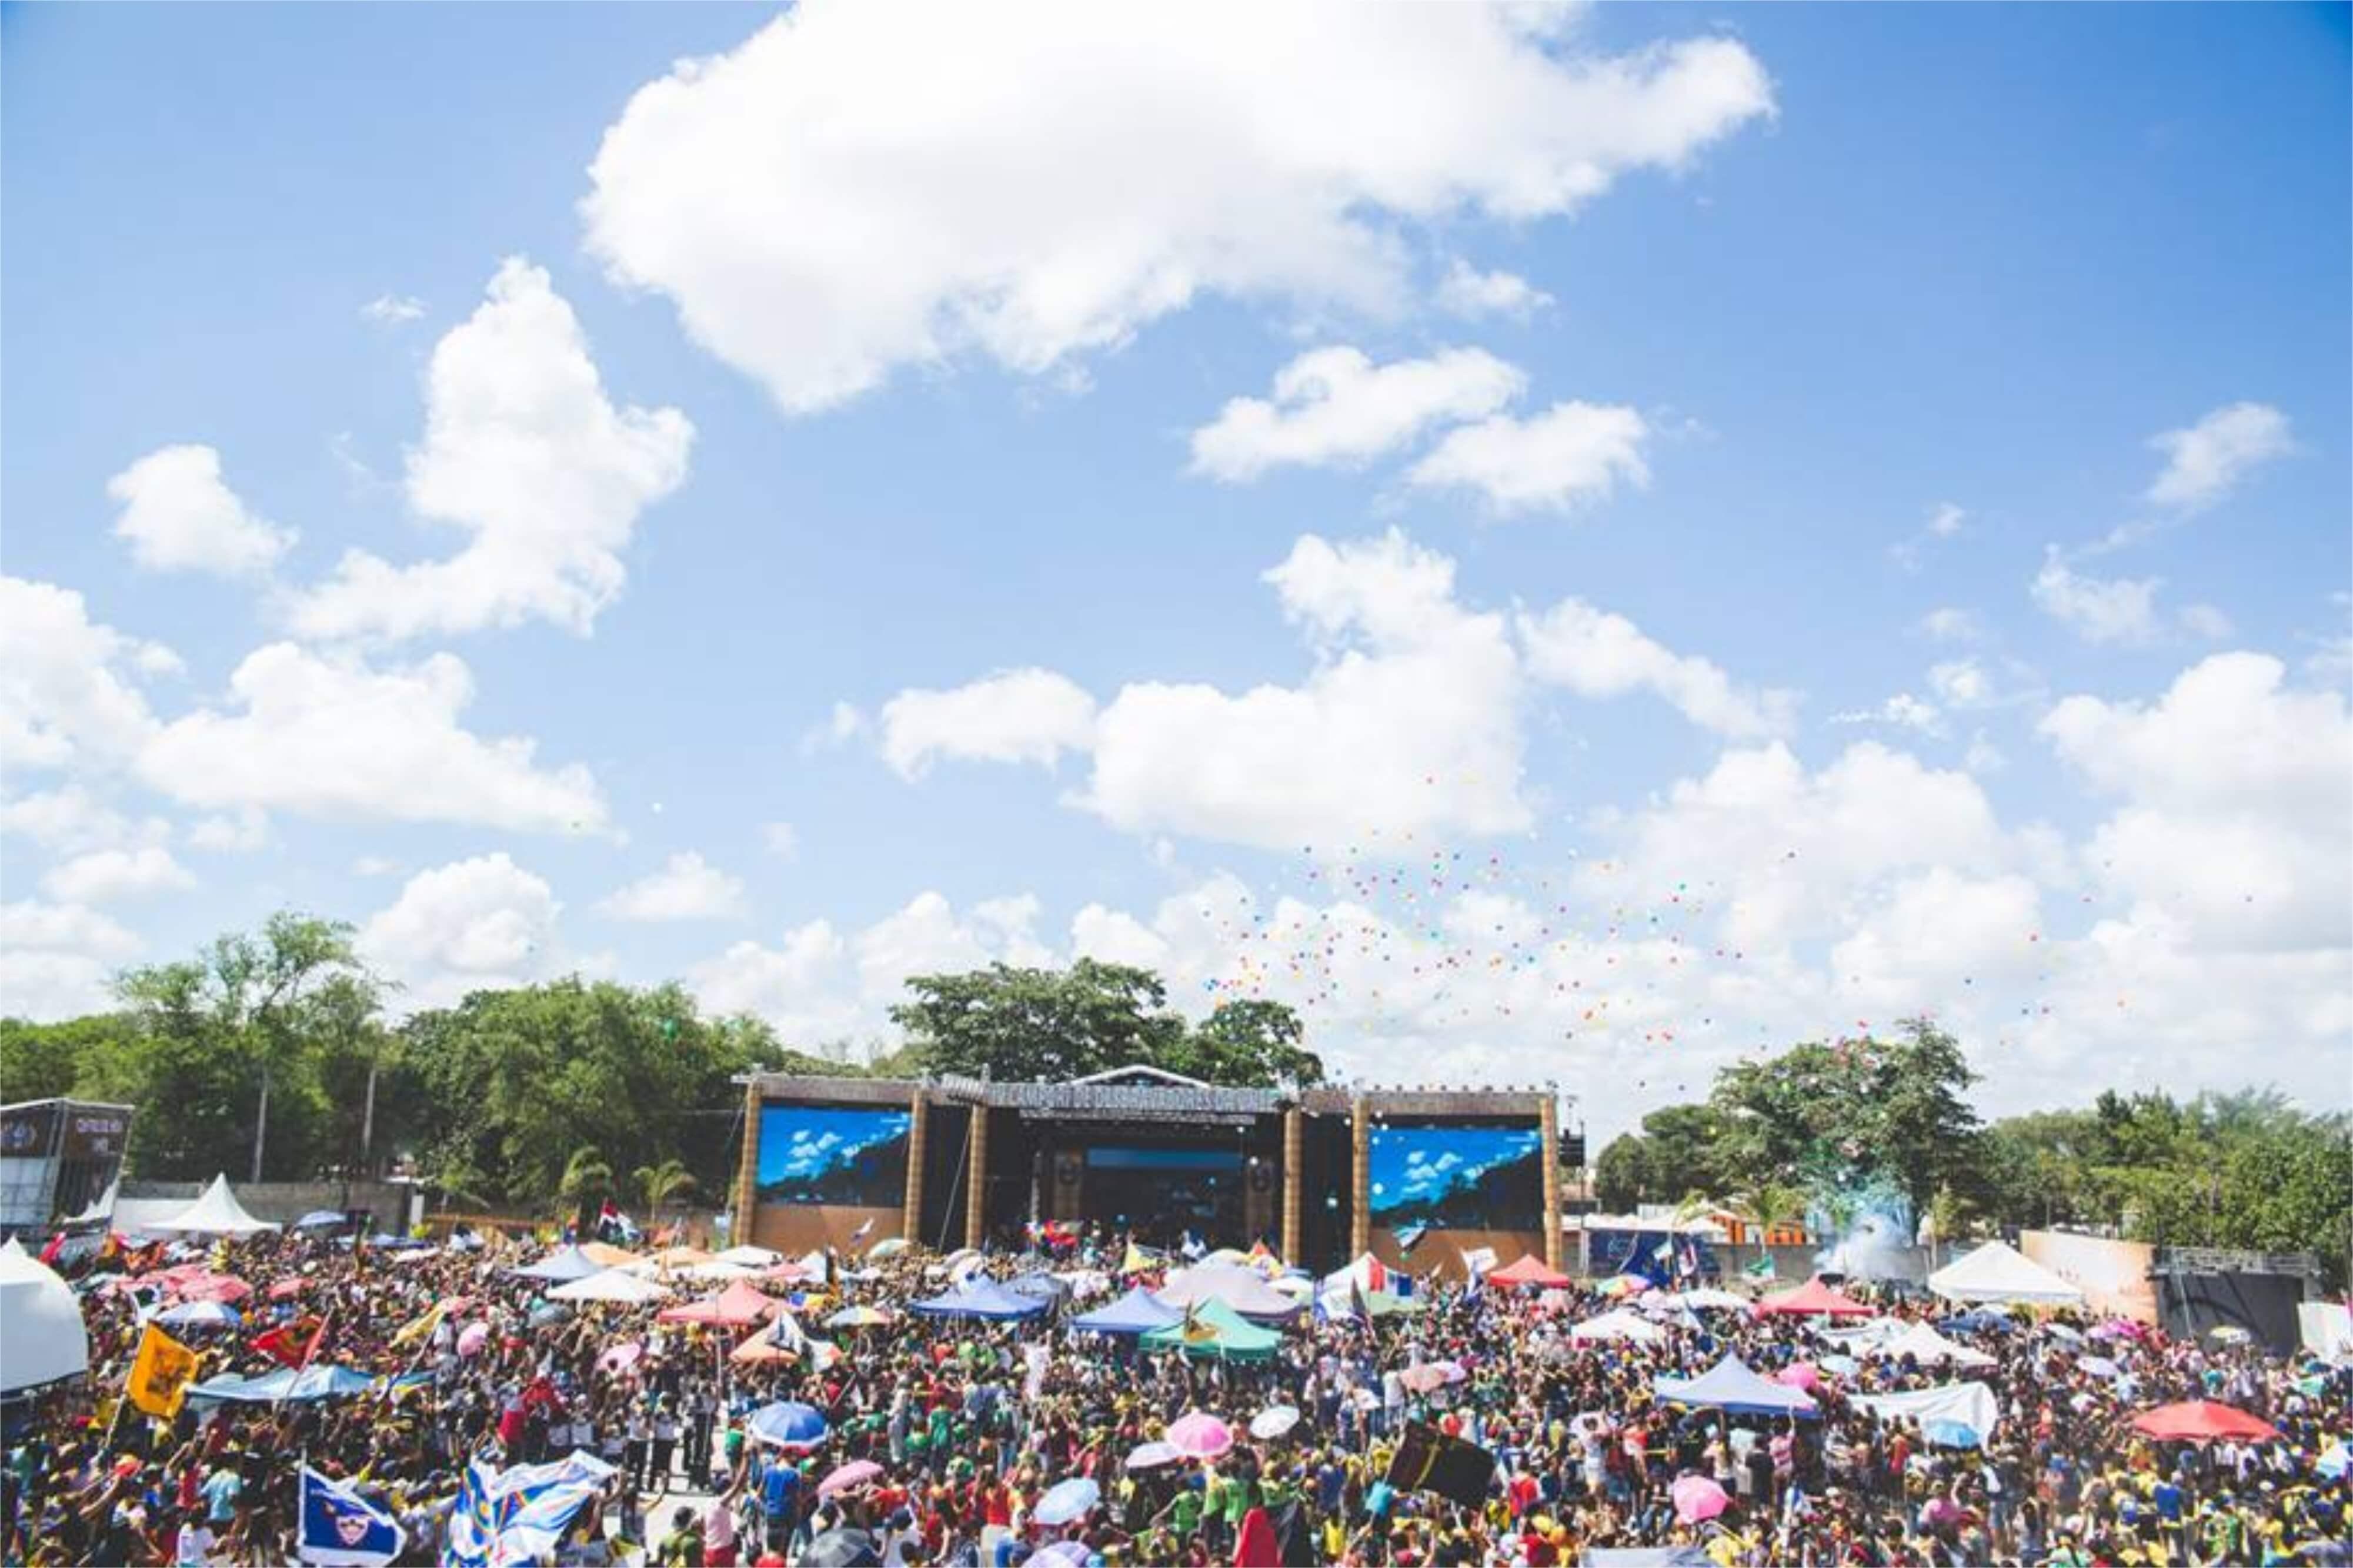 concert, activities for last days of summer